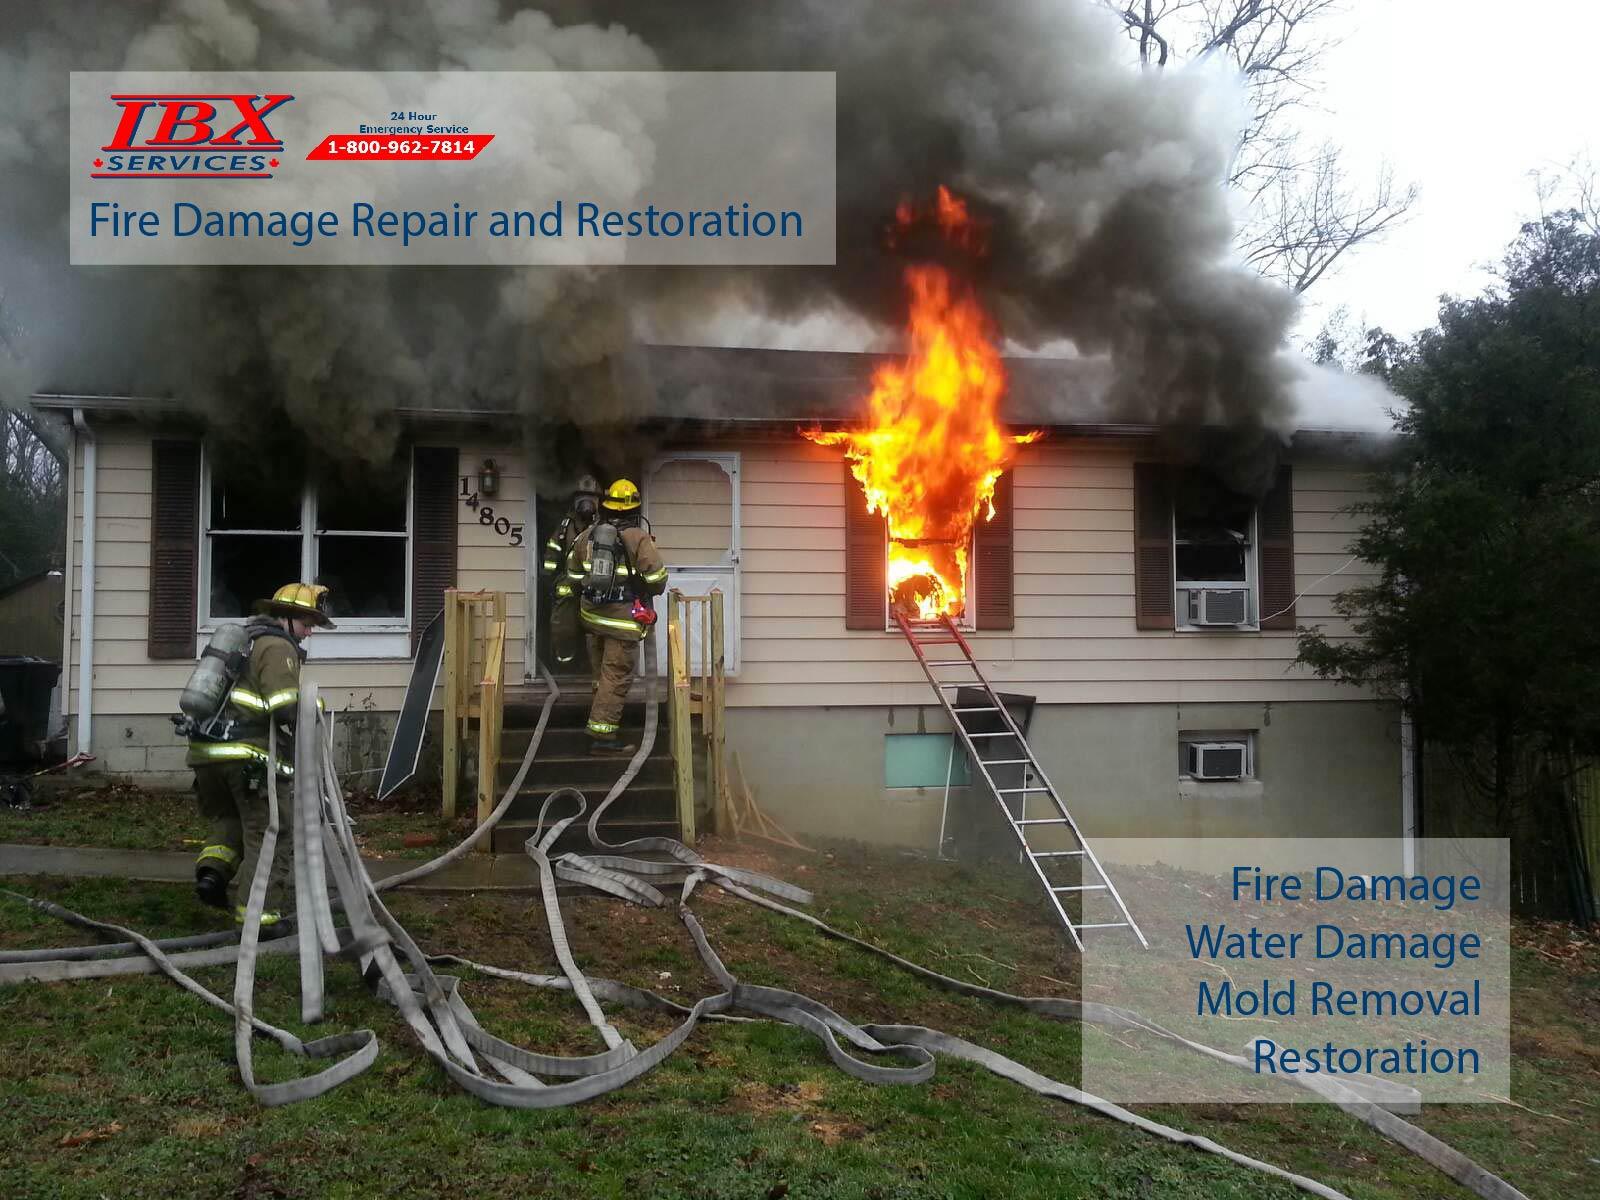 Fire Damage Repair and Restoration